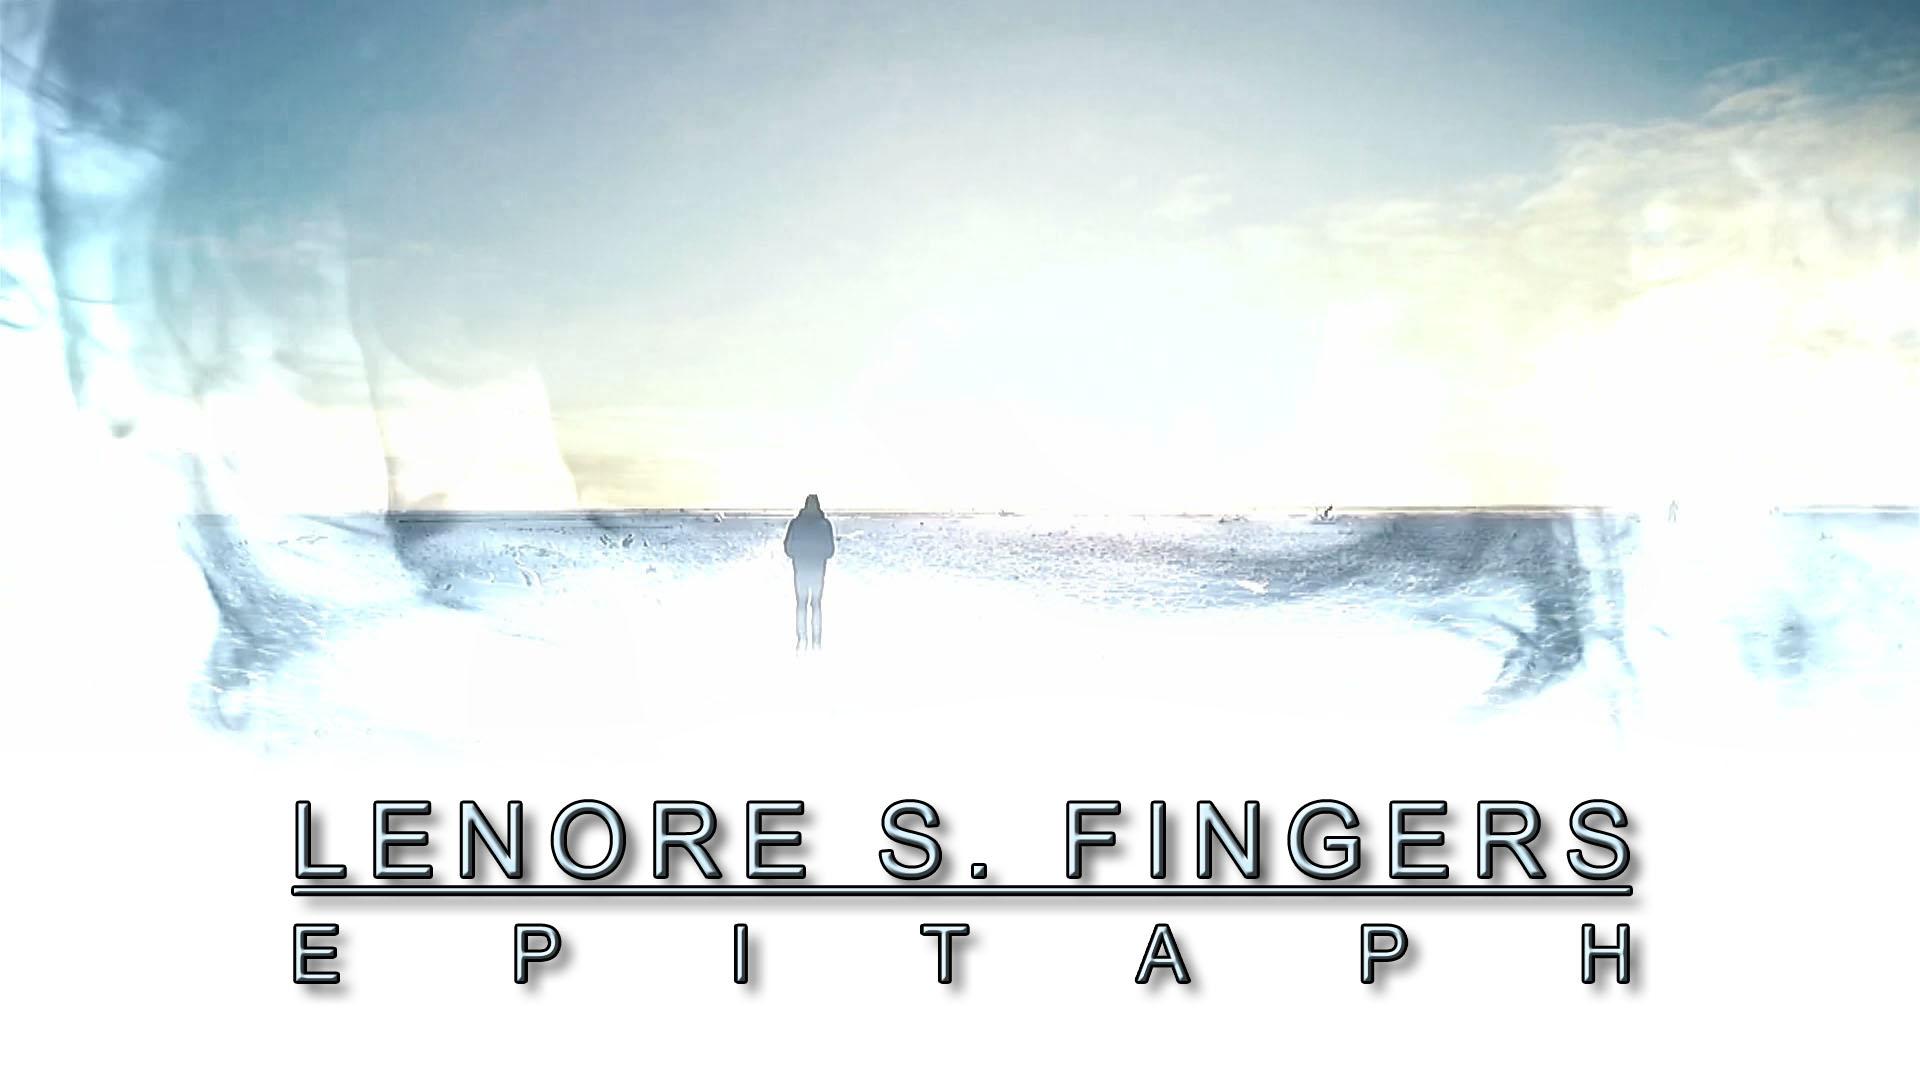 Lenore Epitaph Thumbnail